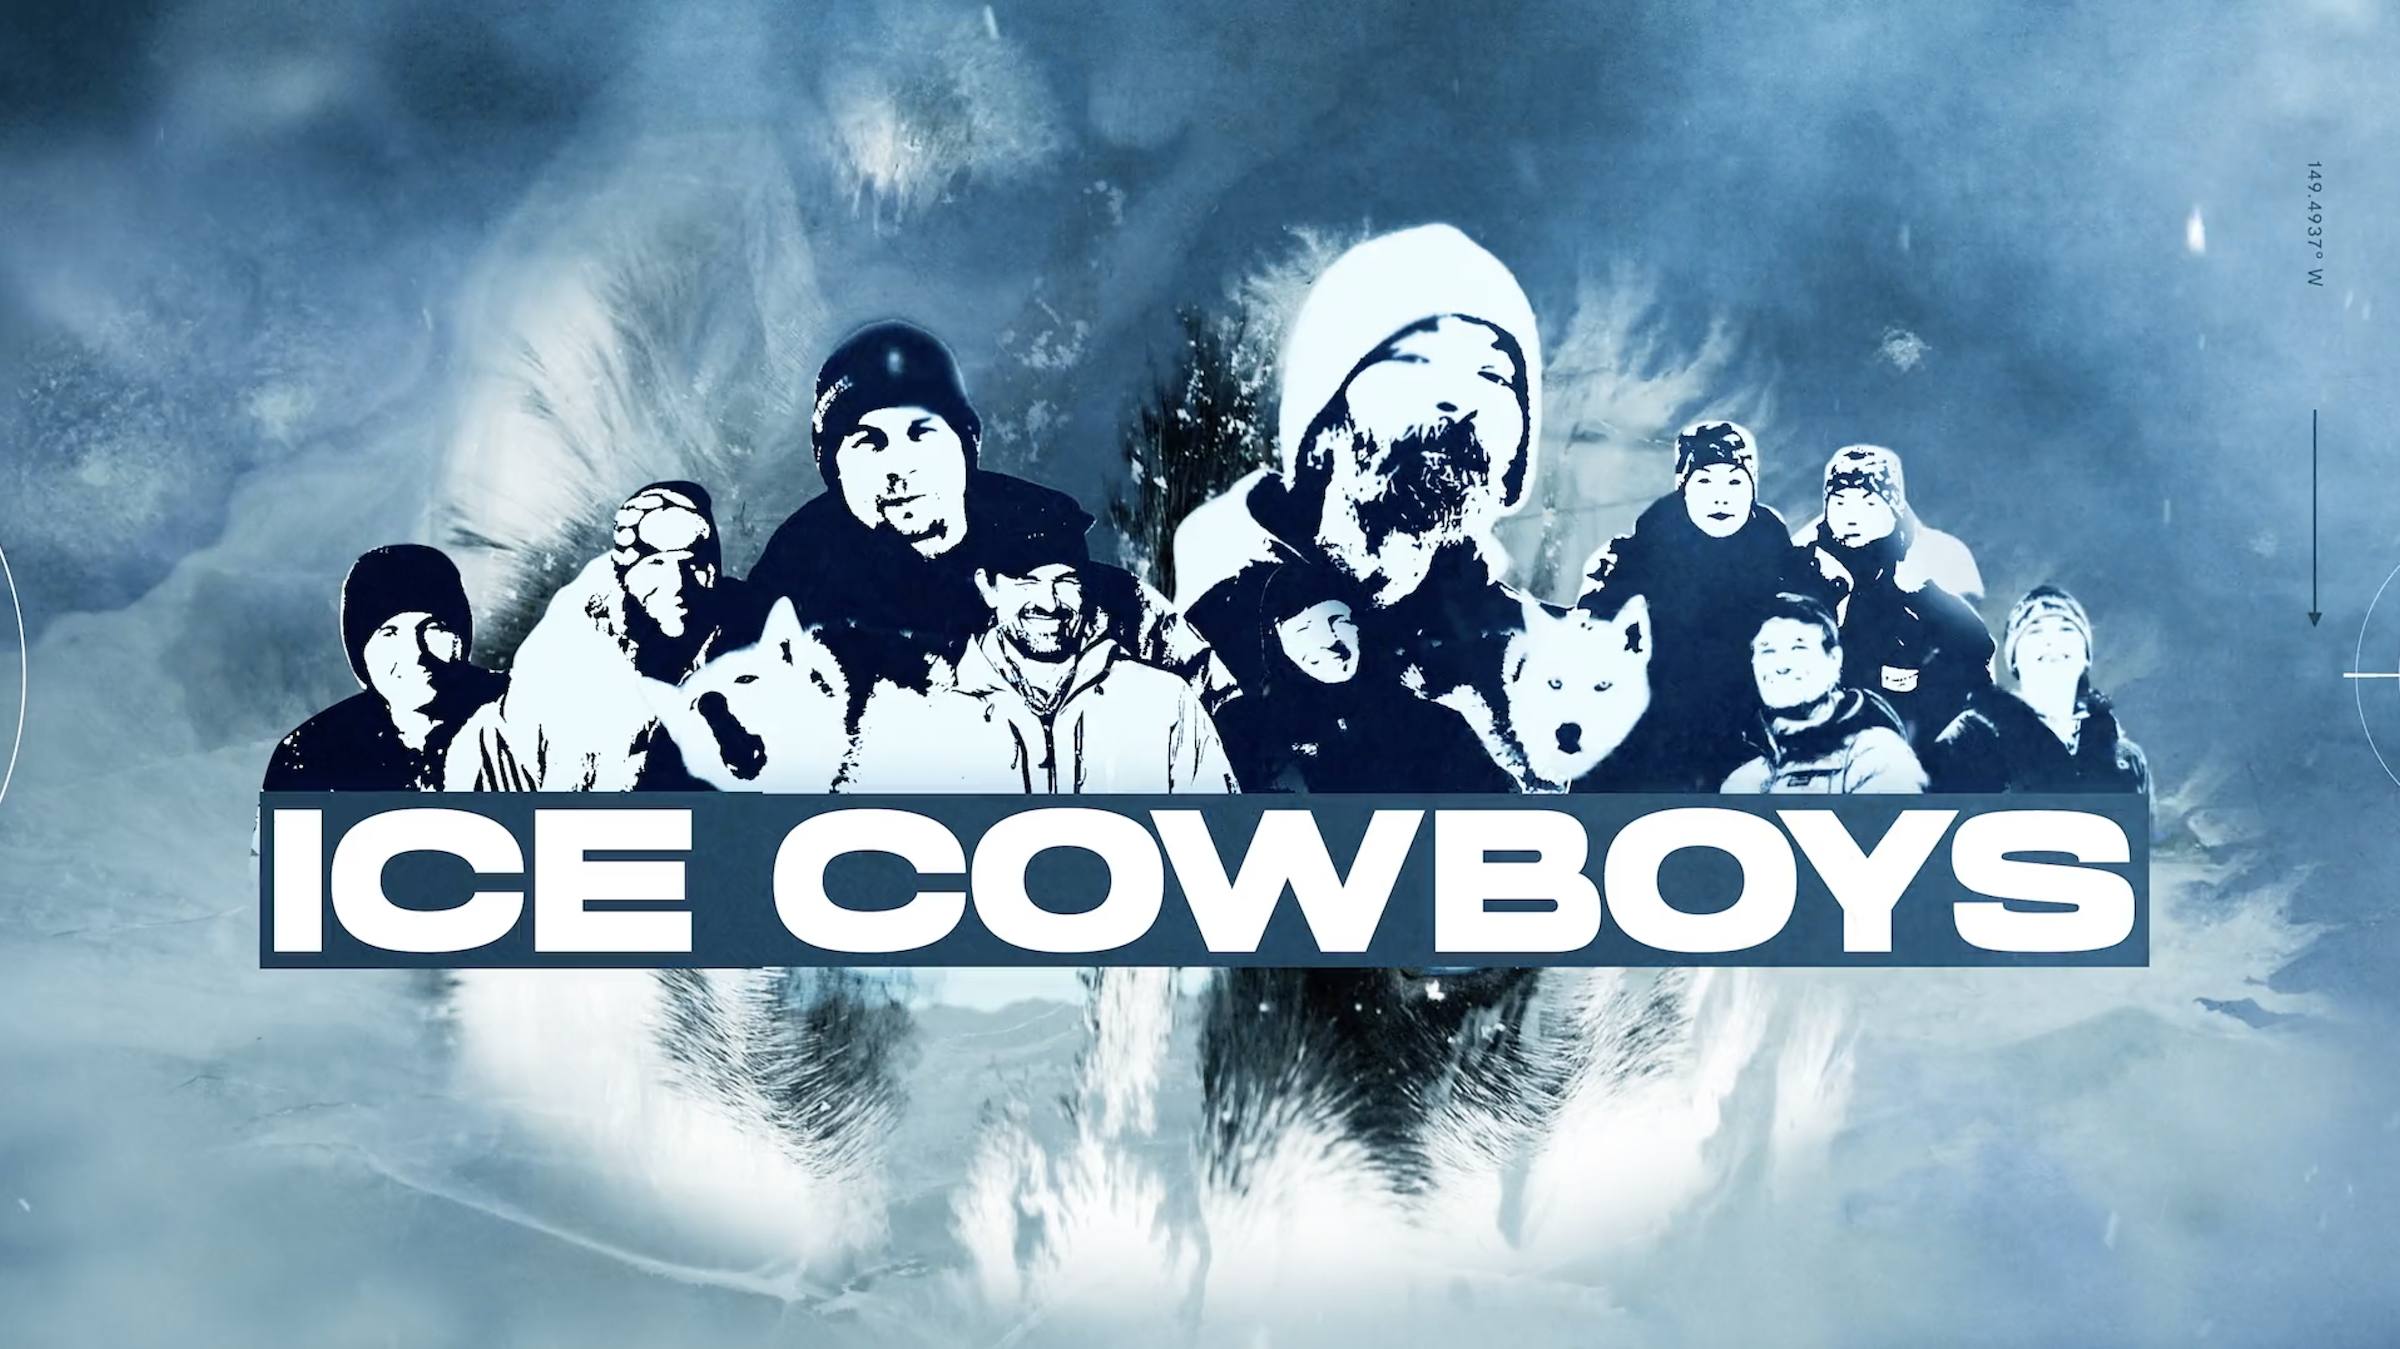 Ice Cowboys - It's a dog's world